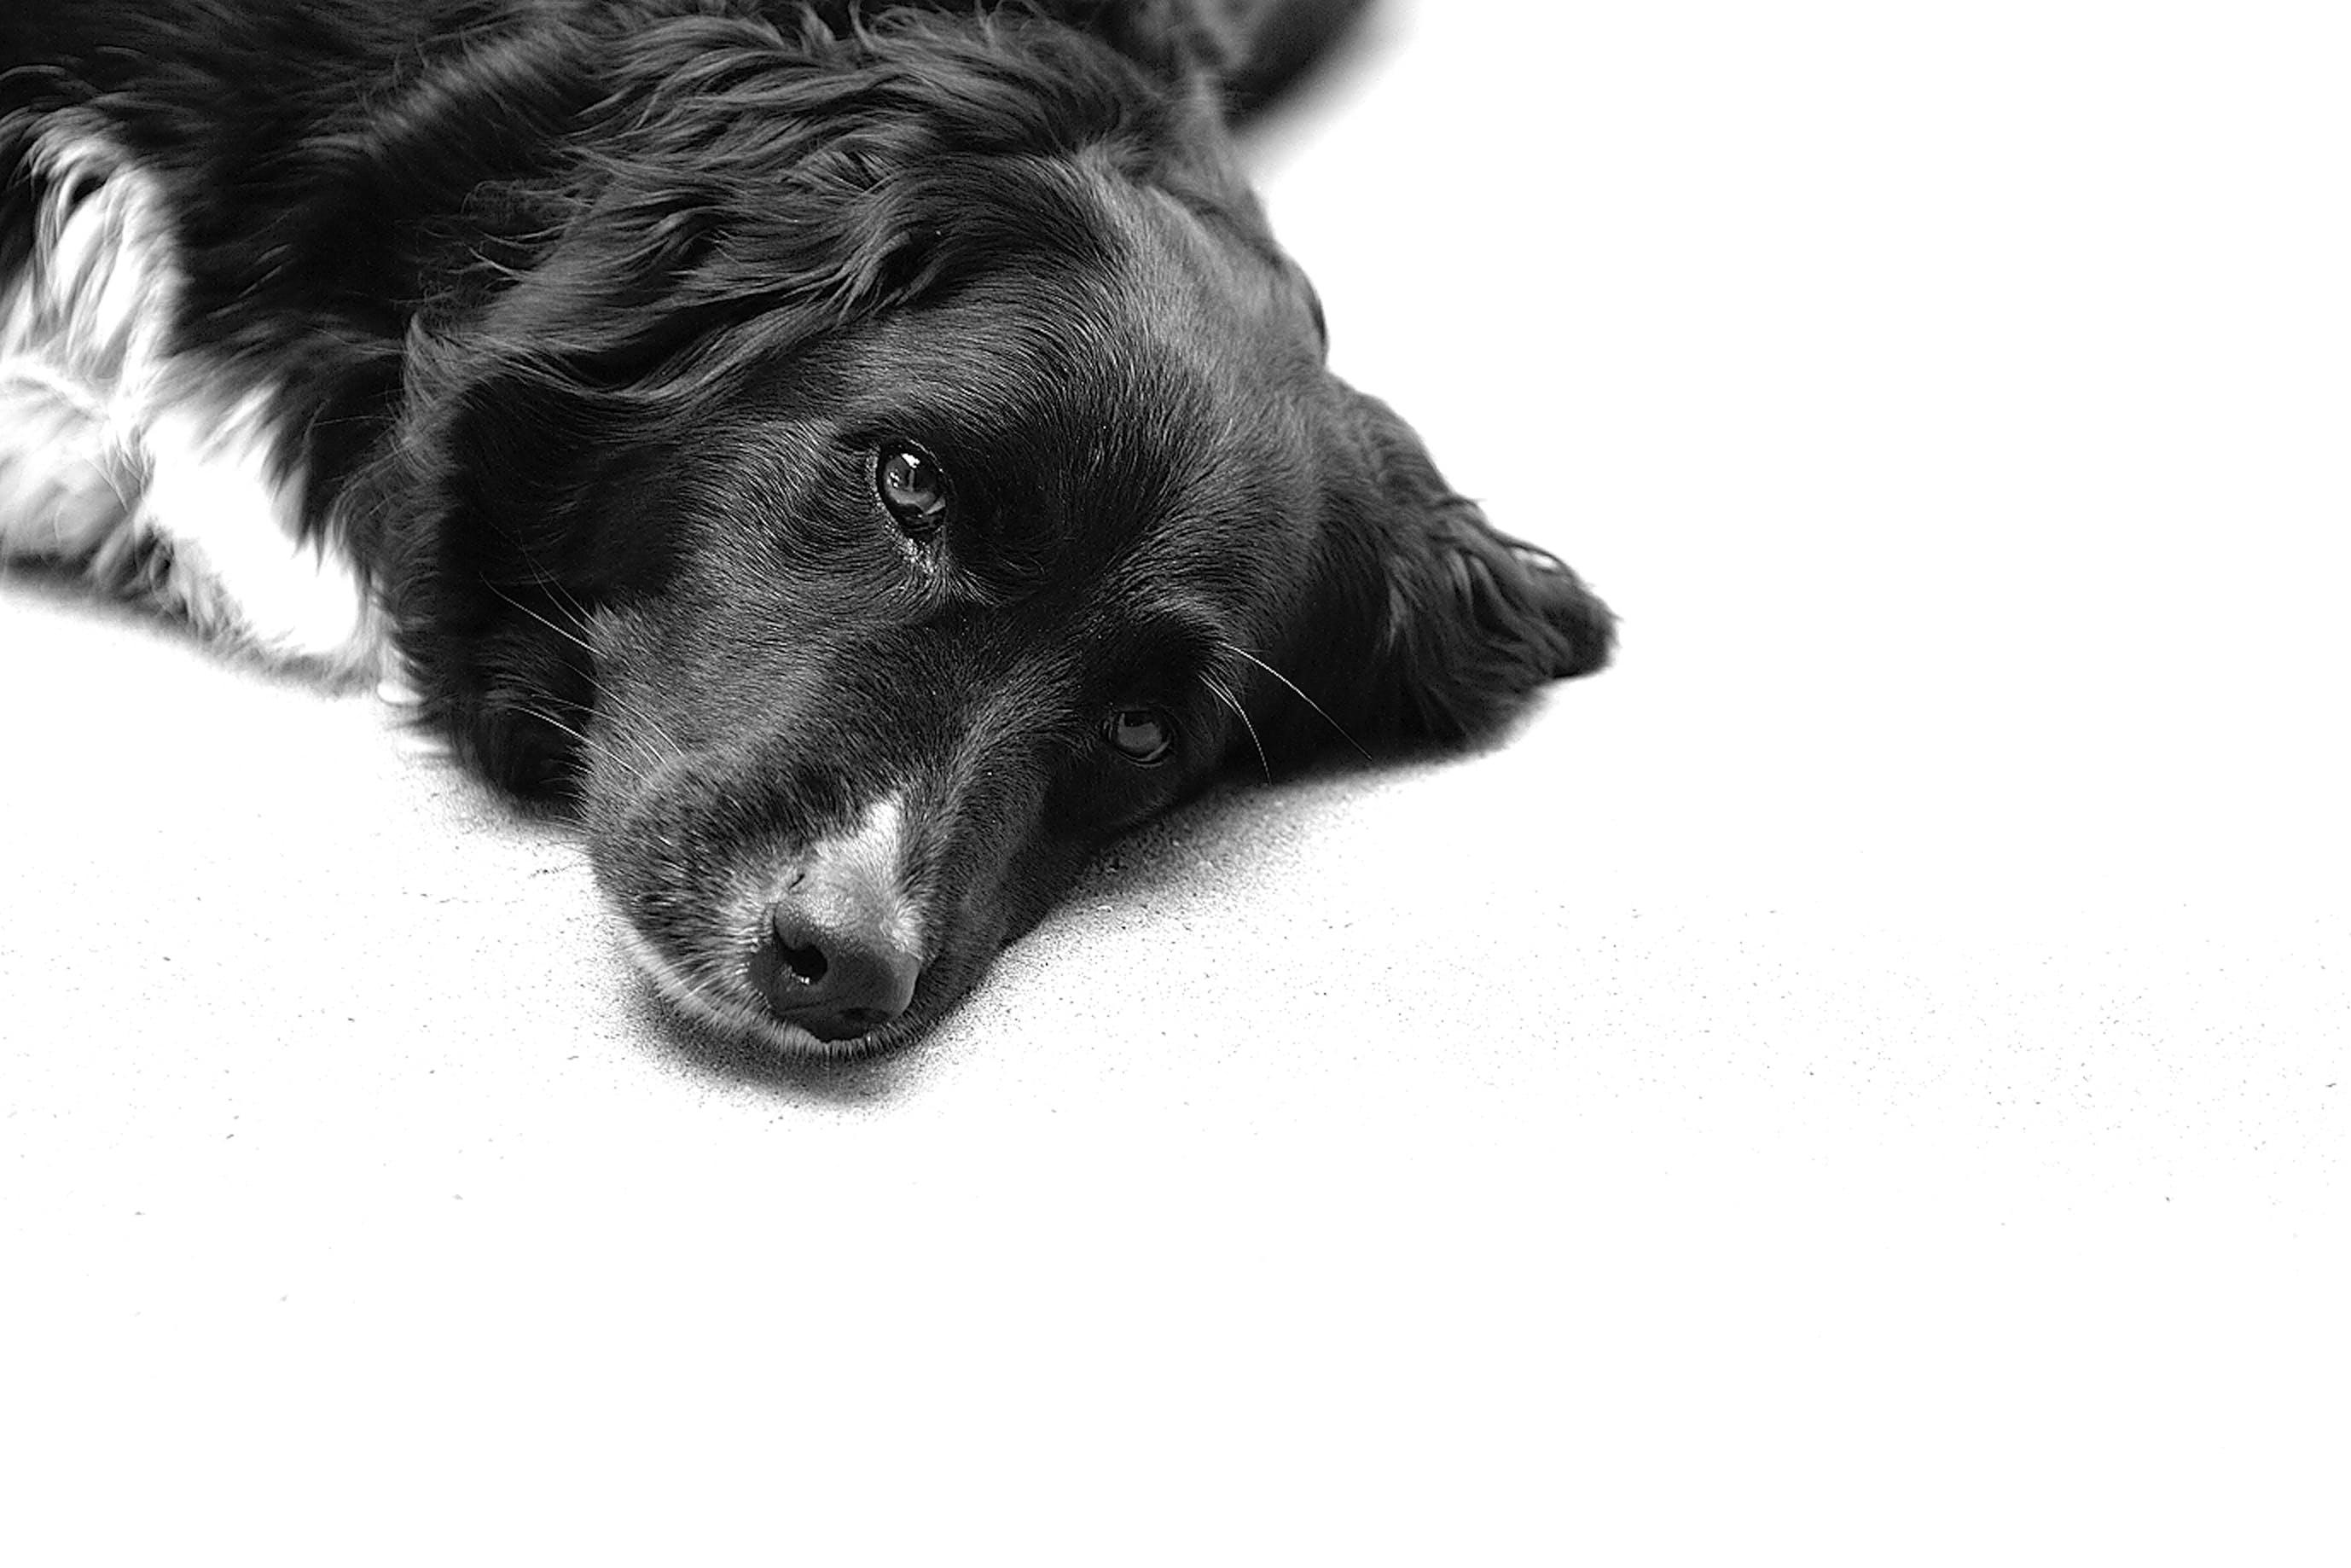 Free stock photo of black&white, dog head